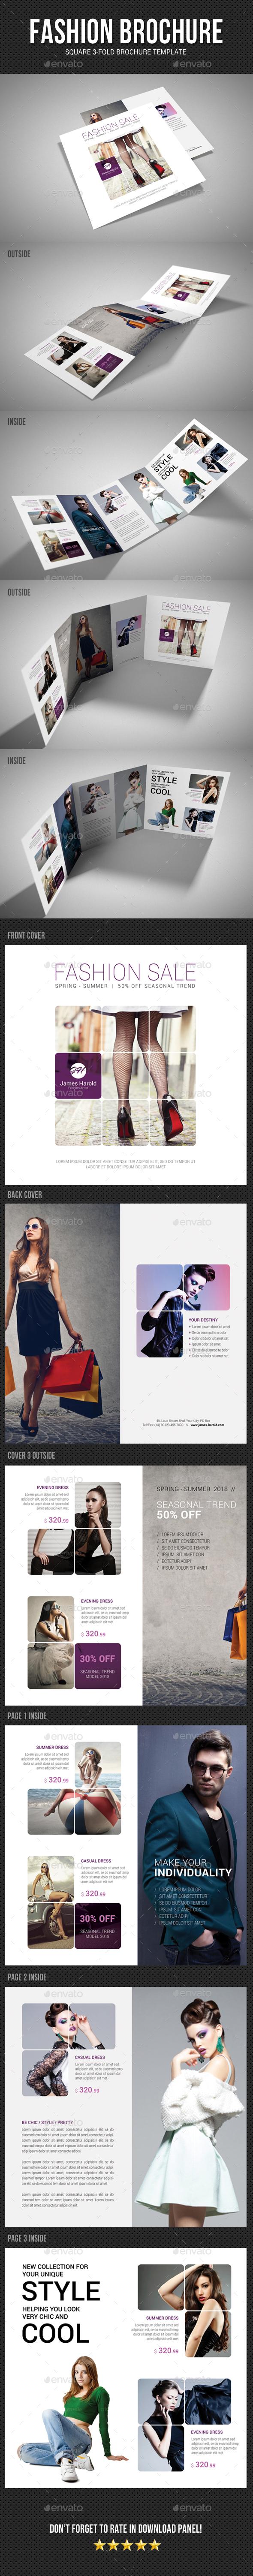 Square Tri-Fold Fashion Brochure 03 - Catalogs Brochures